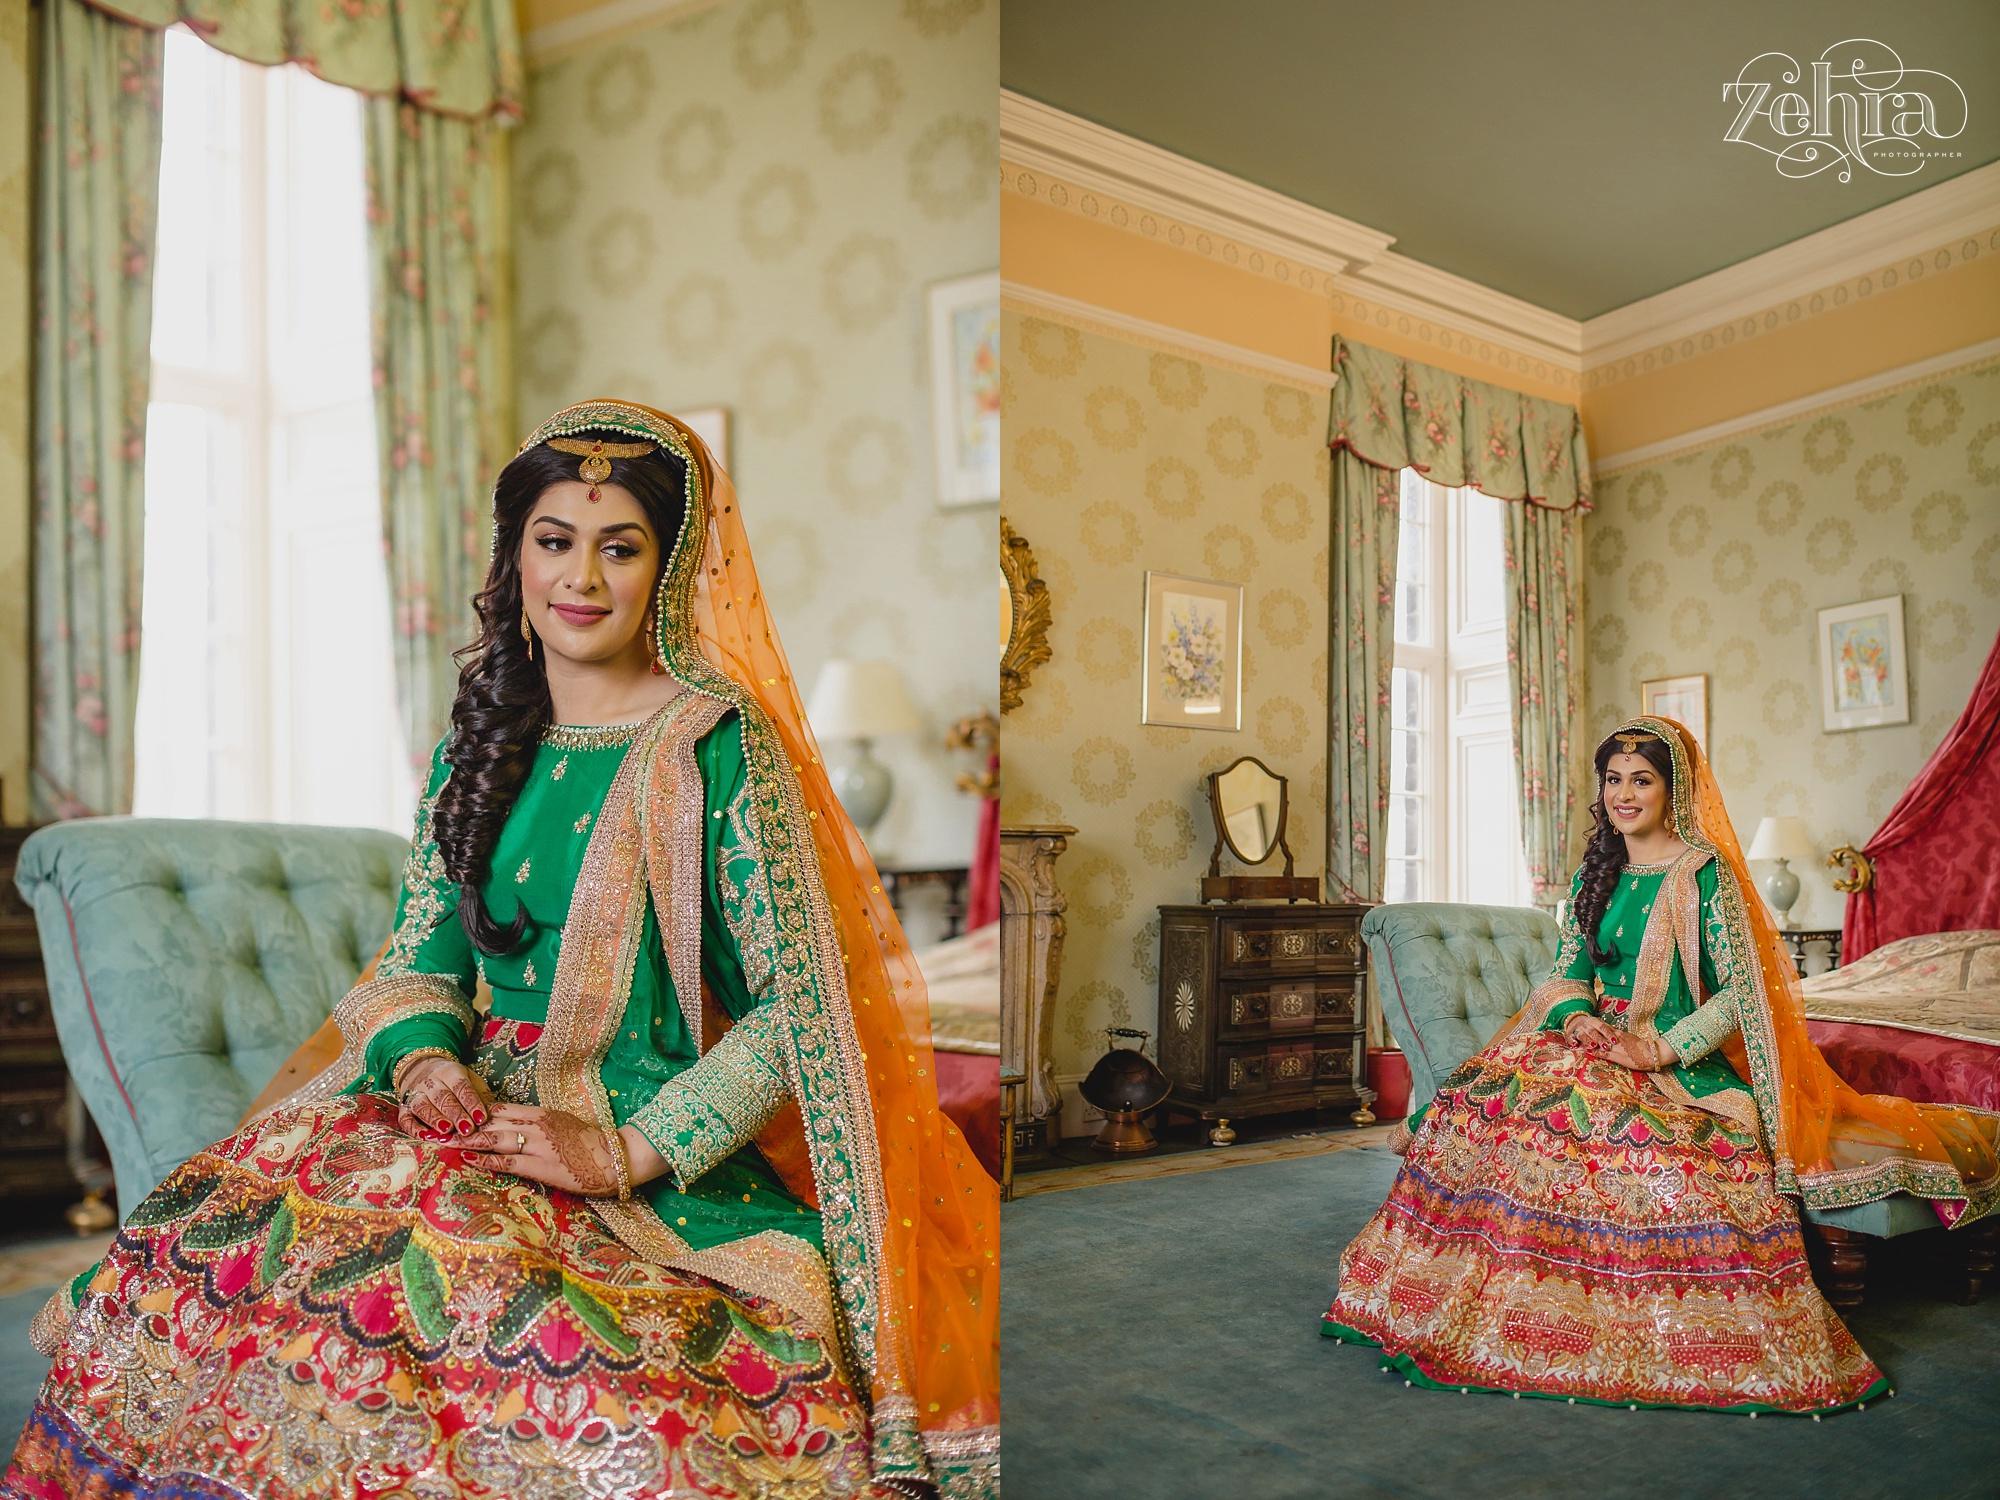 zehra wedding photographer arley hall cheshire011.jpg